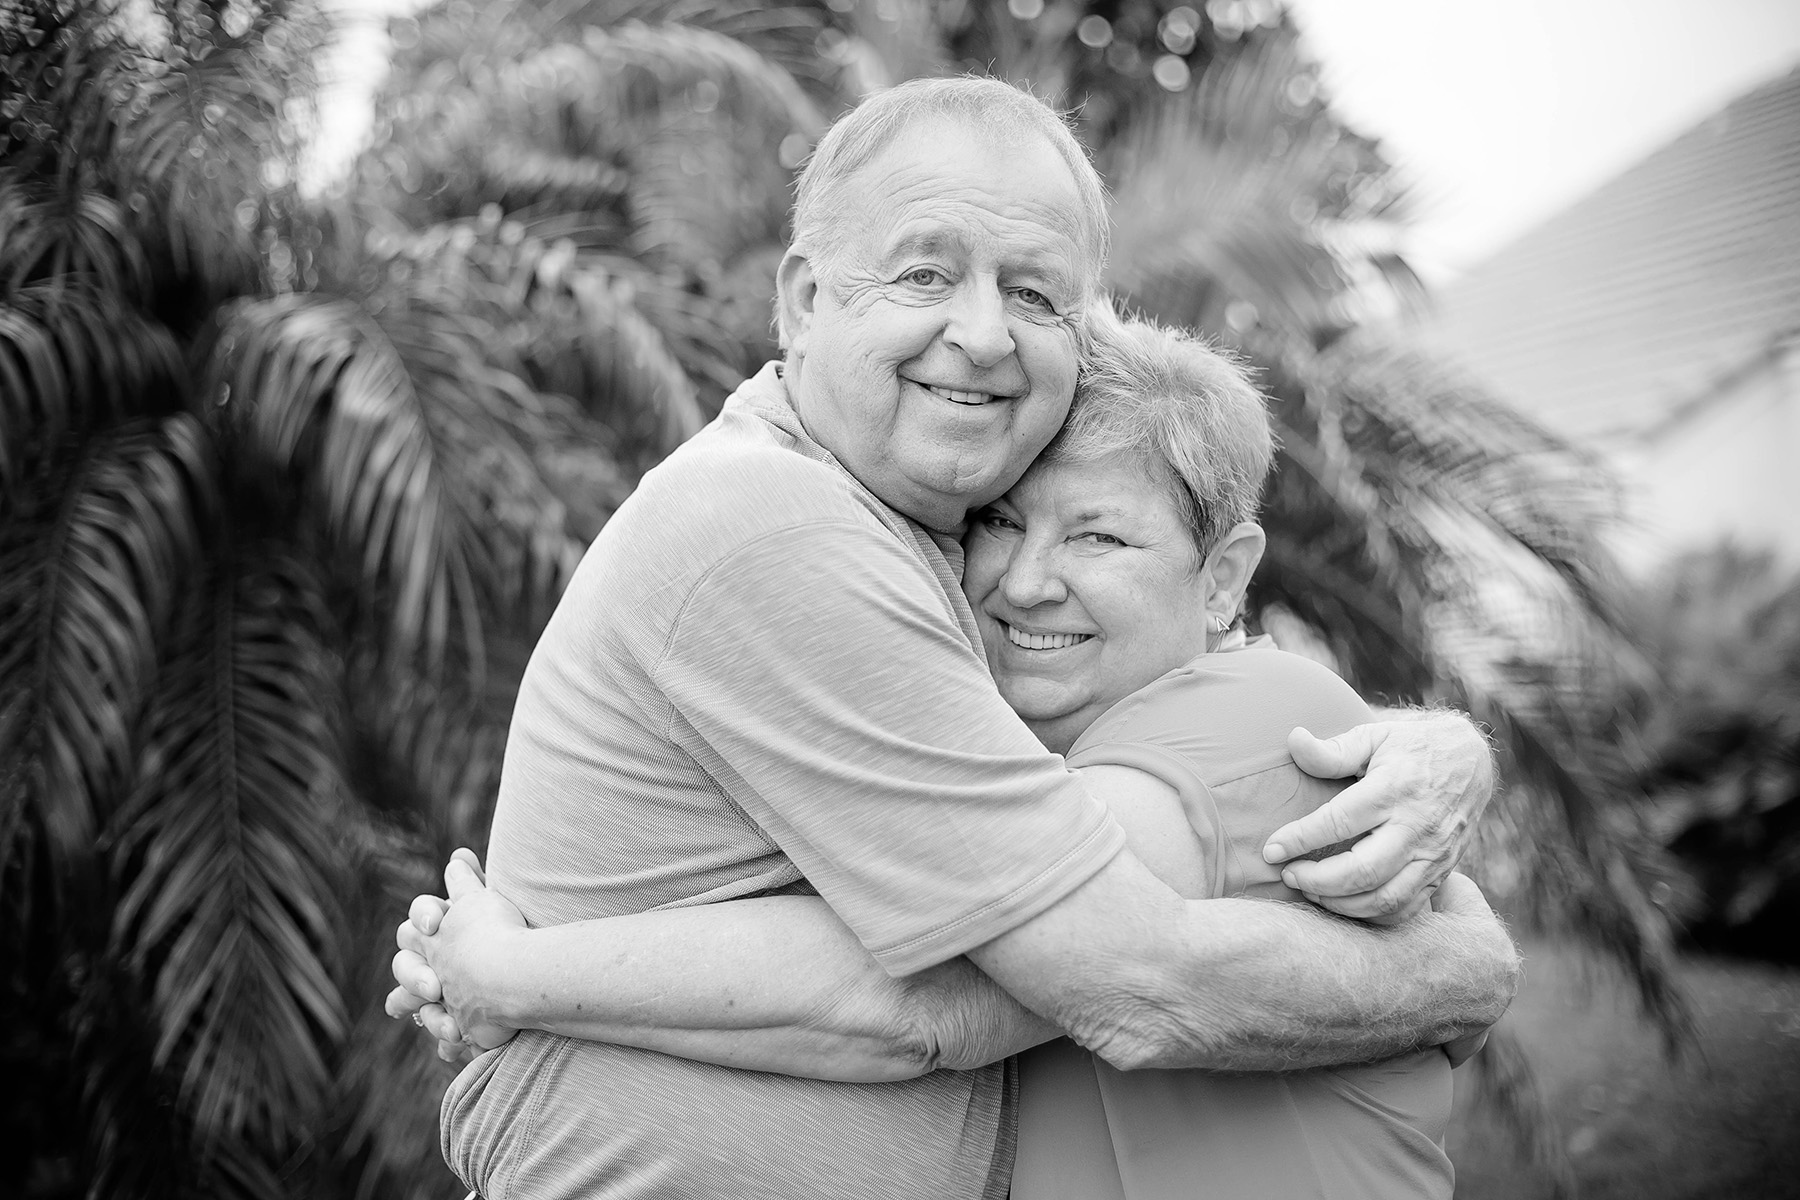 boca-raton-family-portraits-grandparents-seniors-elderly-old-love-memories-important-treasure-portriats.jpg